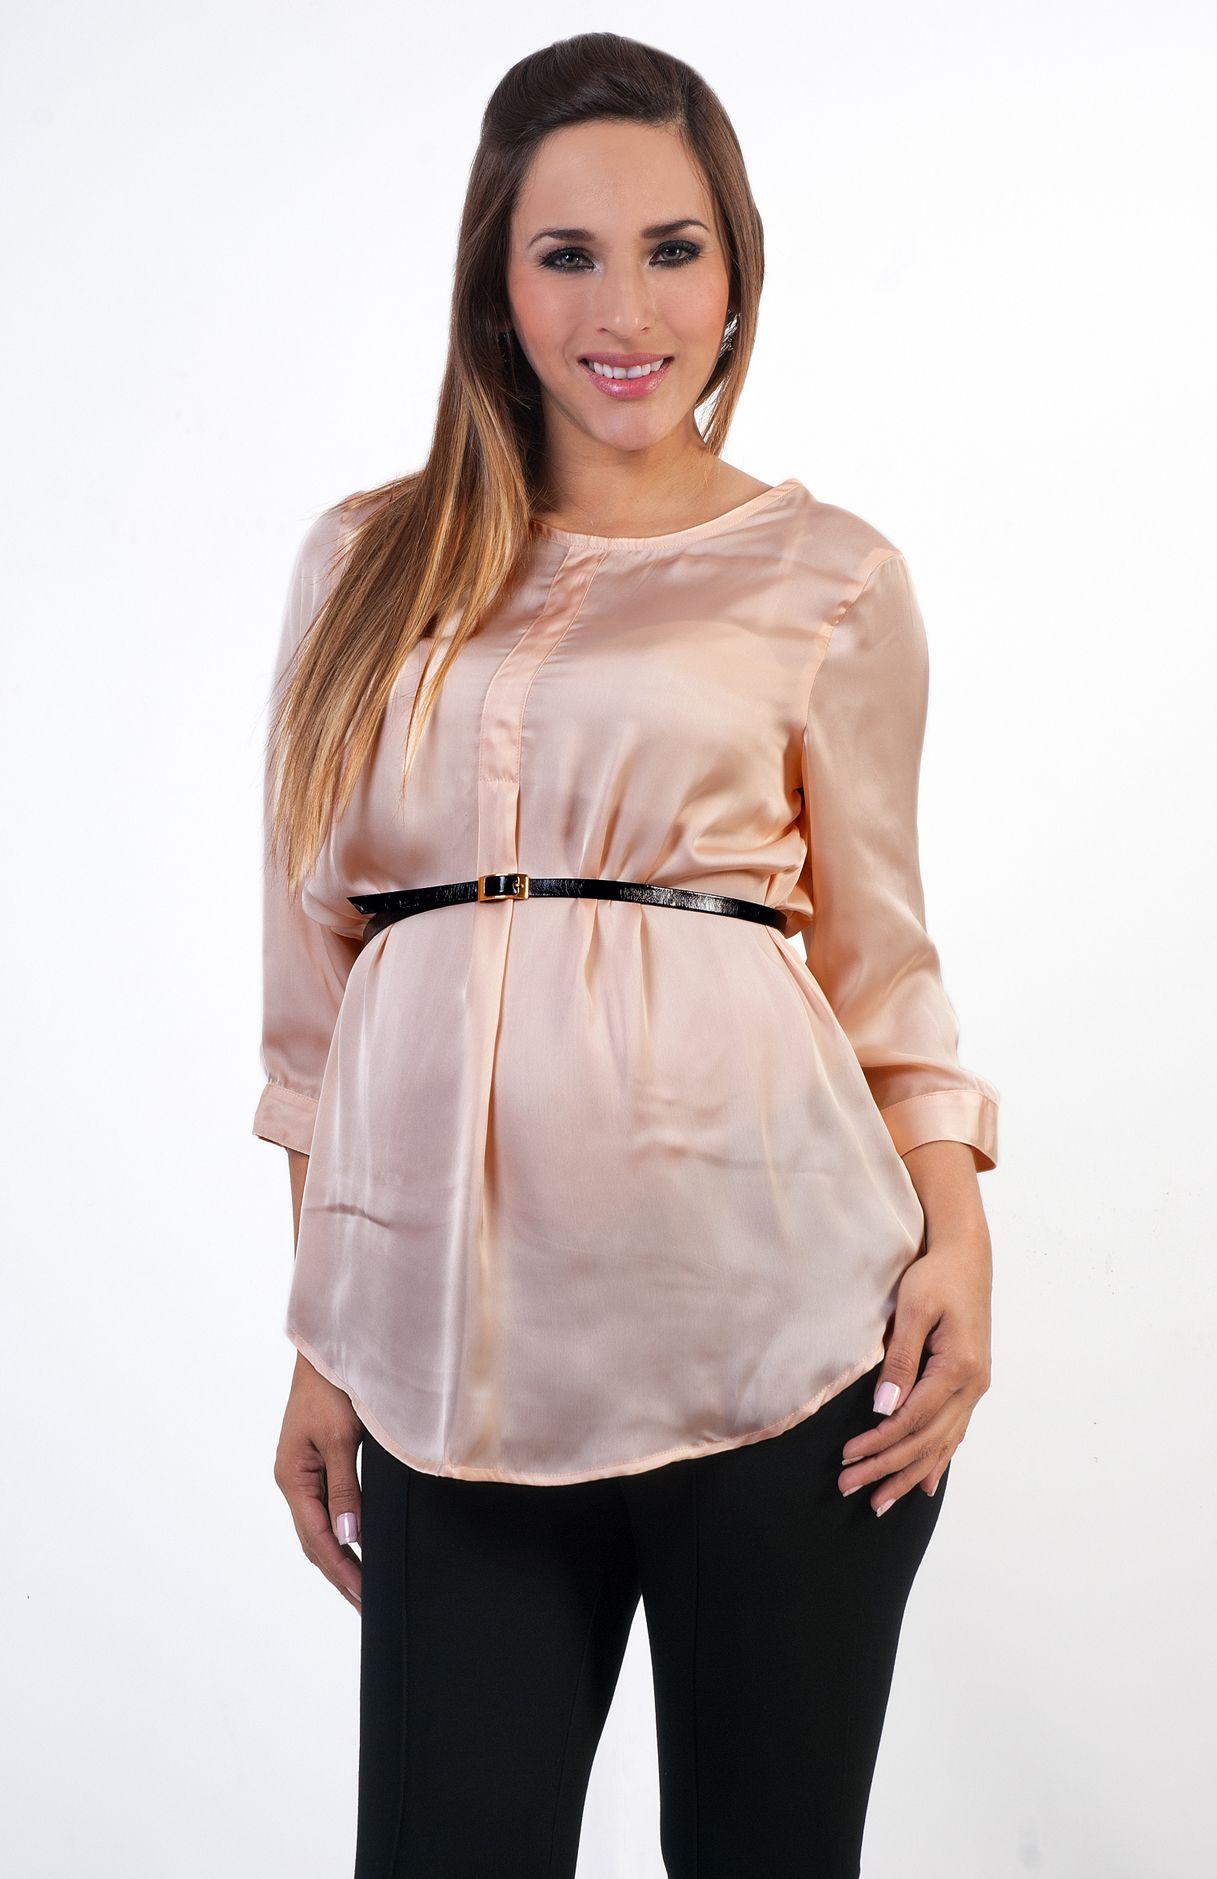 1bde8368d ropa de maternidad  blusadematernidad  maternityblouse de seda   Athinamaternity